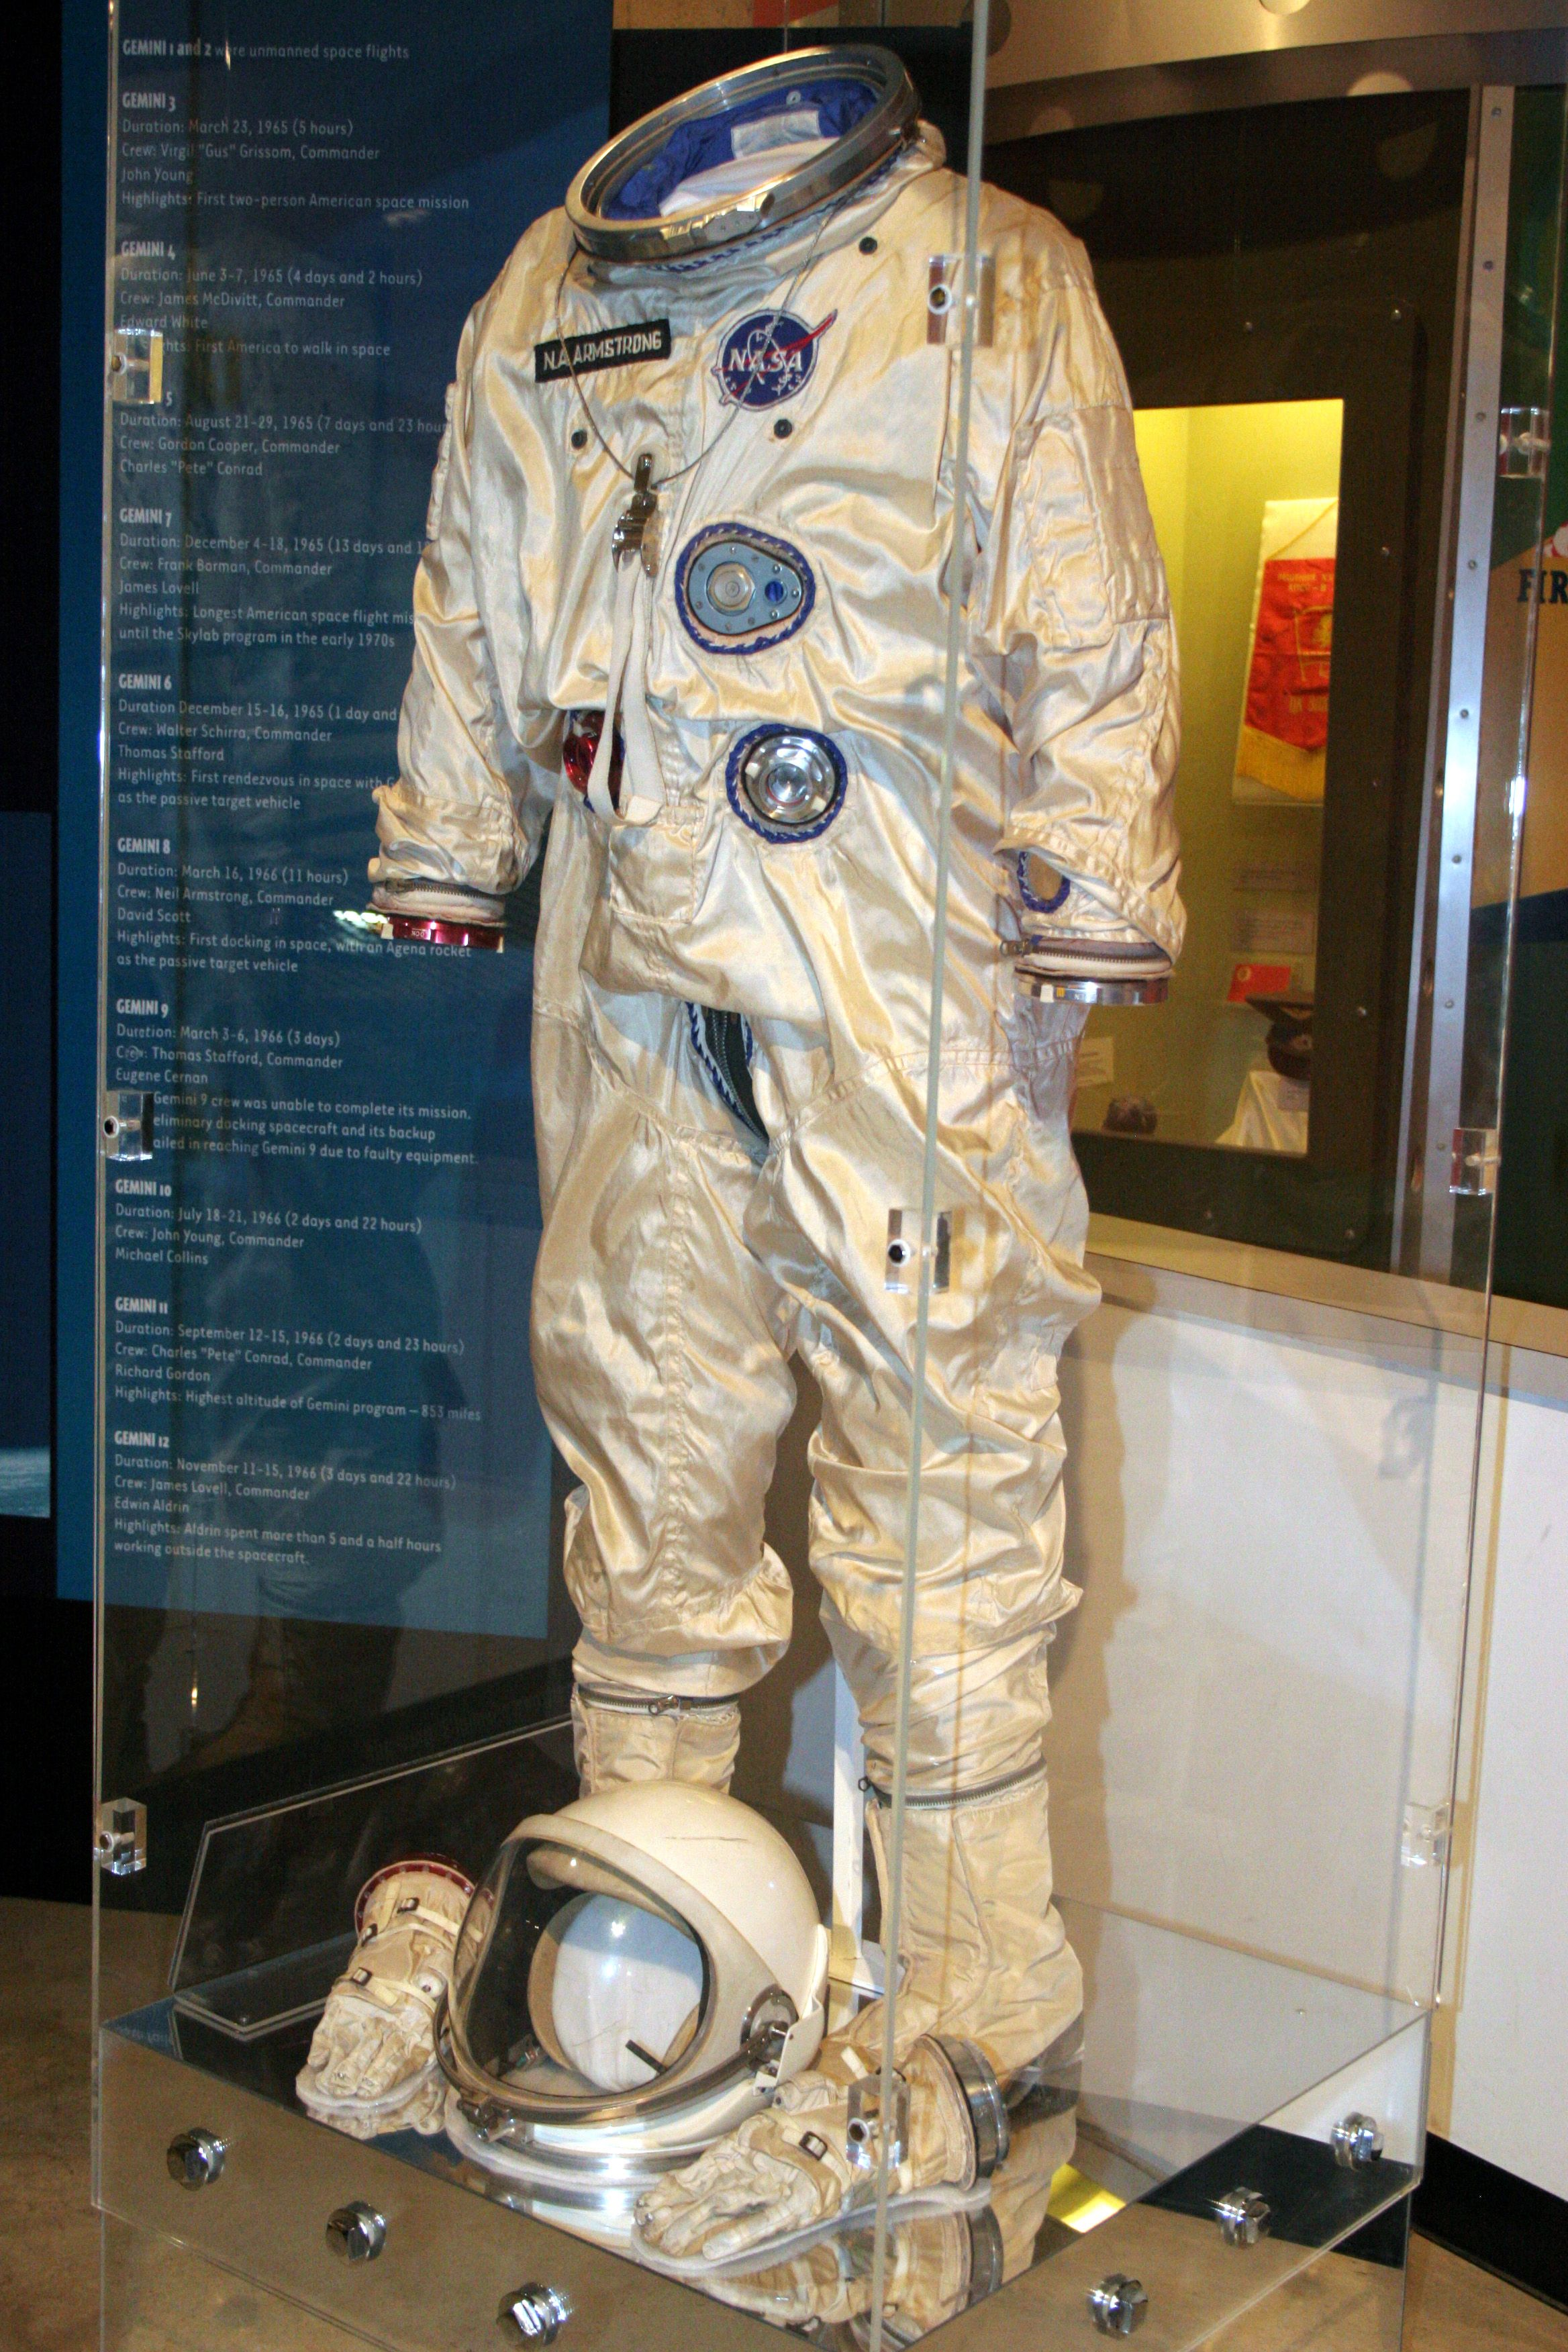 7dbba7433c Neil Armstrong-Gemini 8 suit